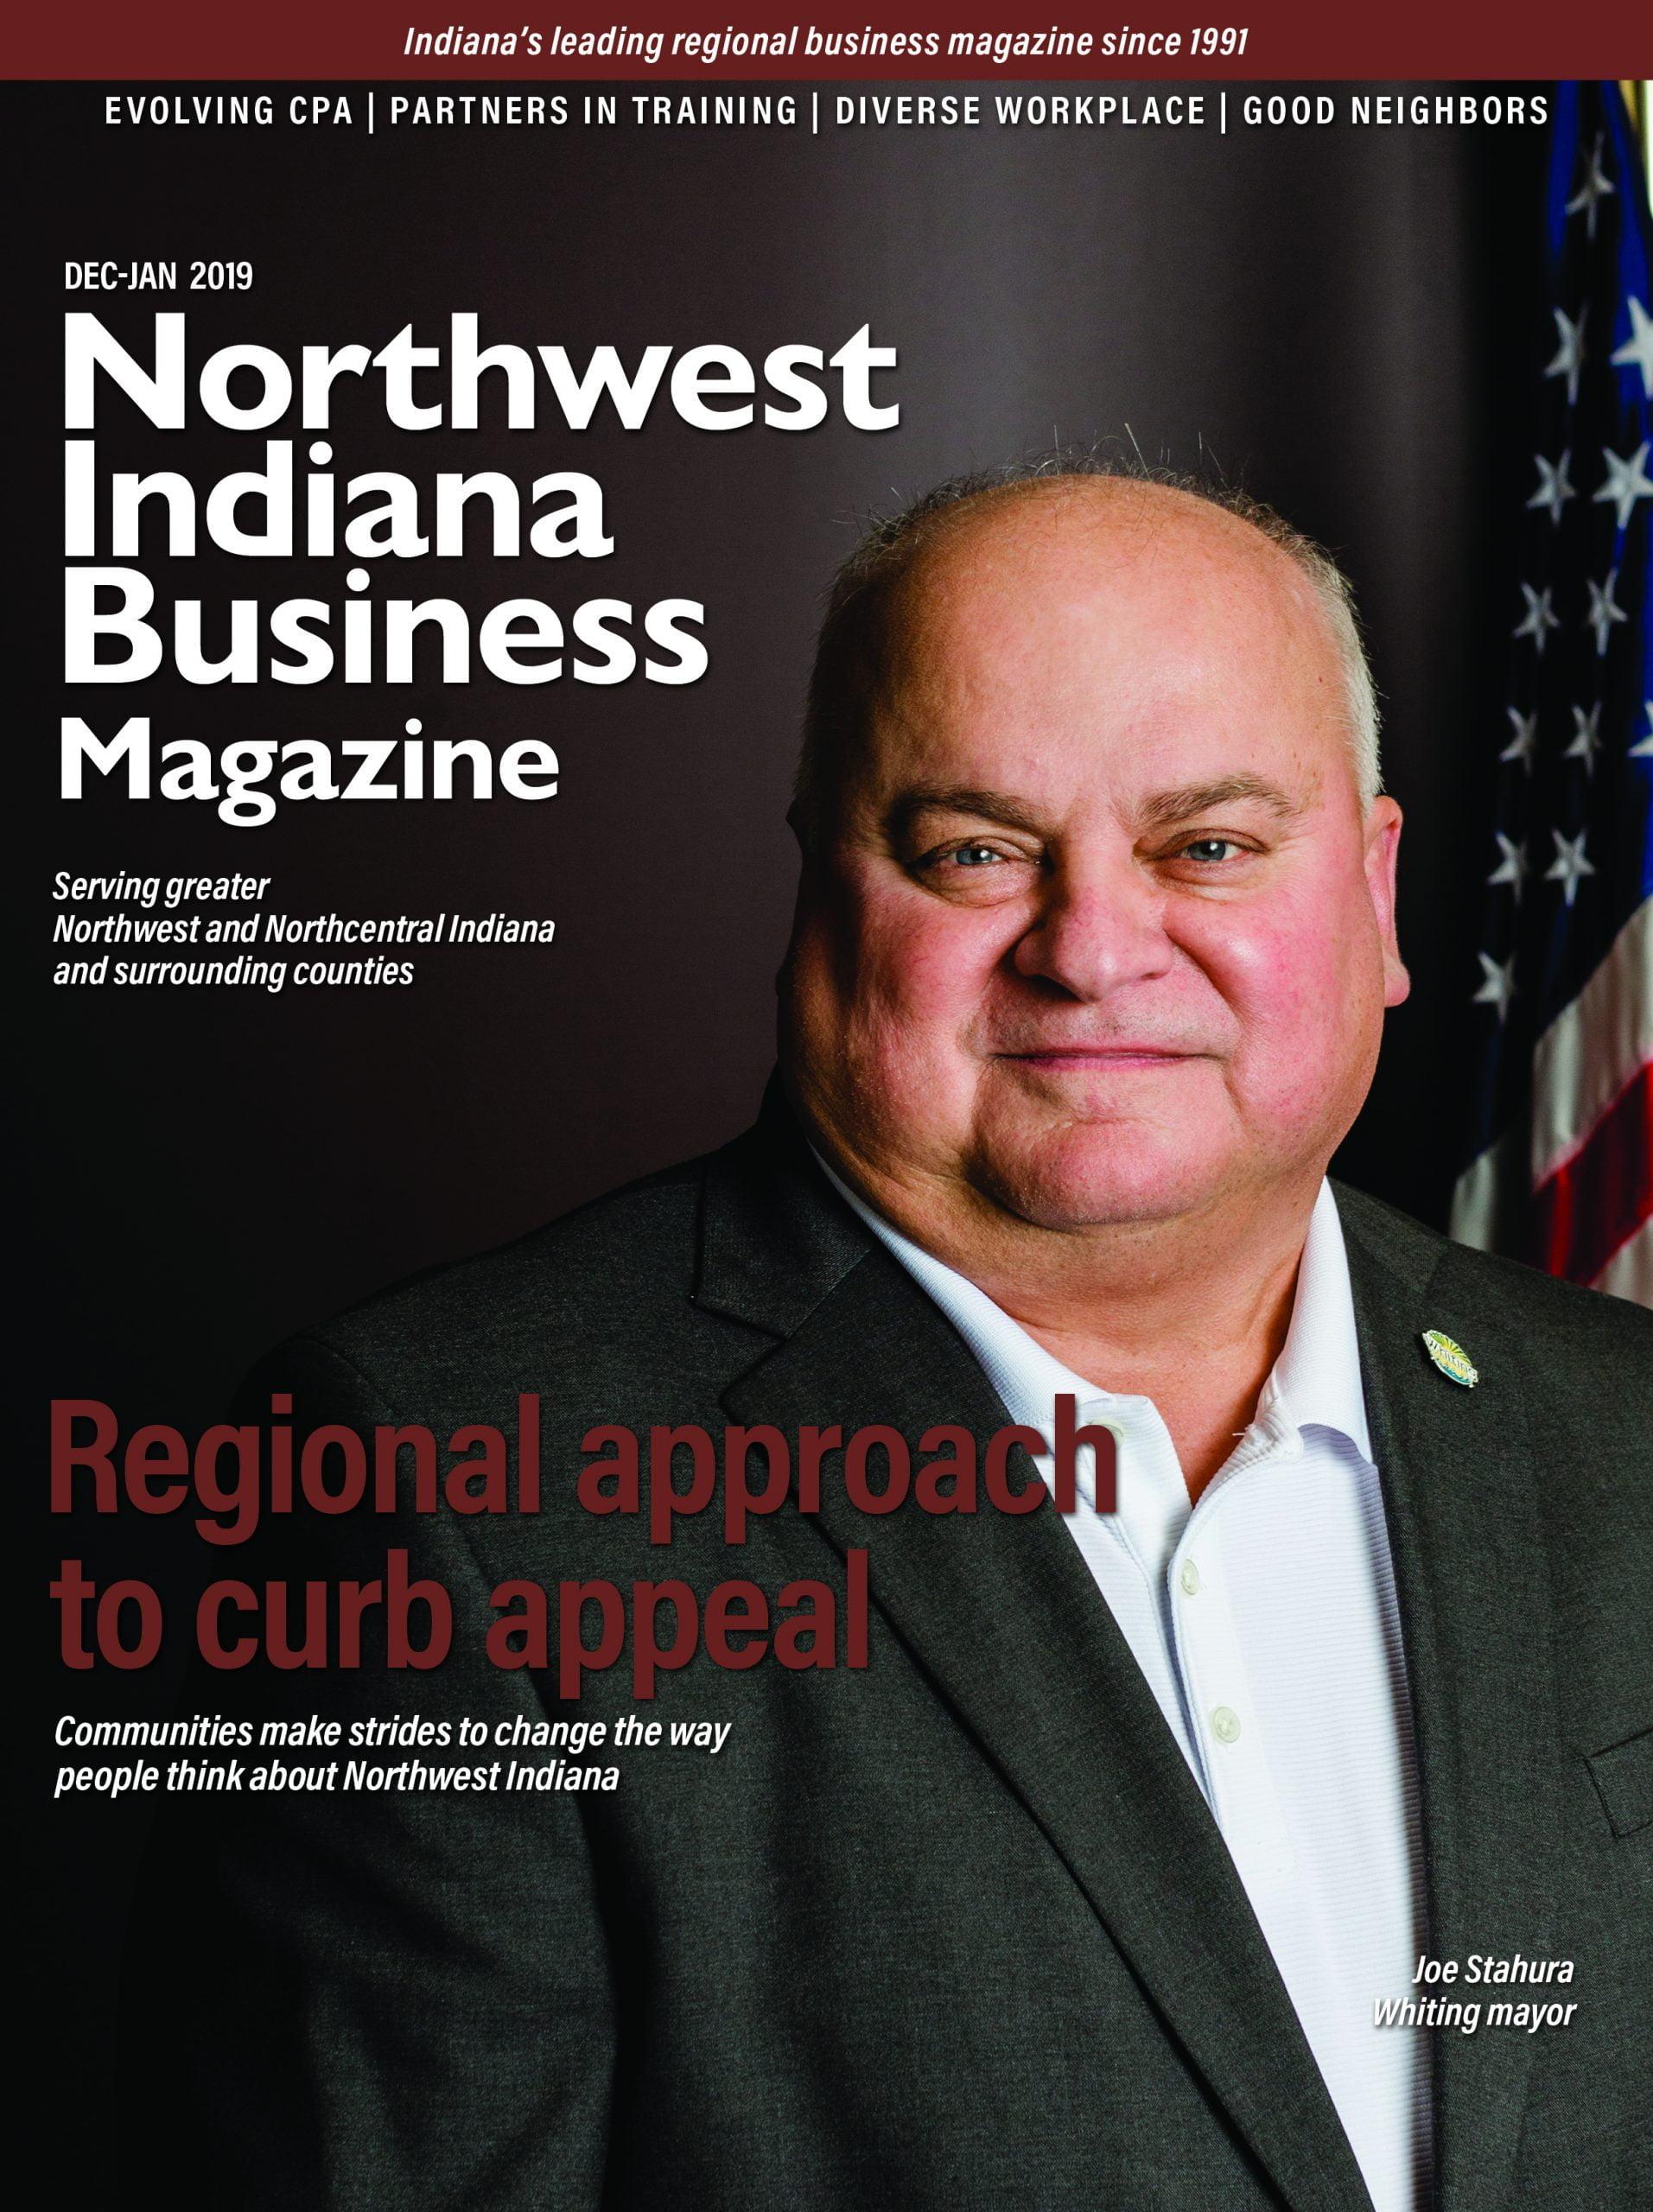 Northwest Indiana Business Magazine Dec-Jan 2019 issue